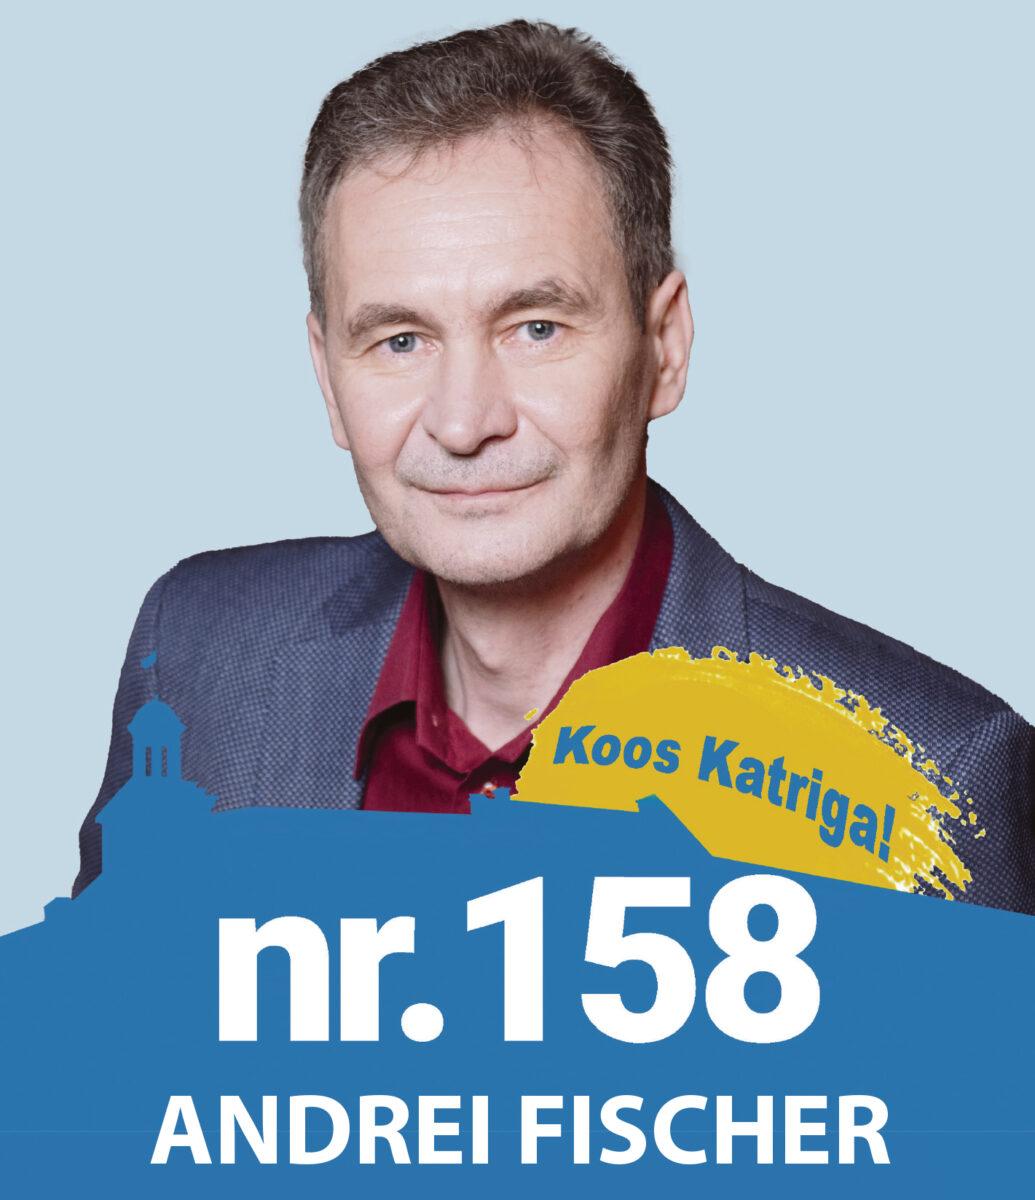 Andrei Fischer